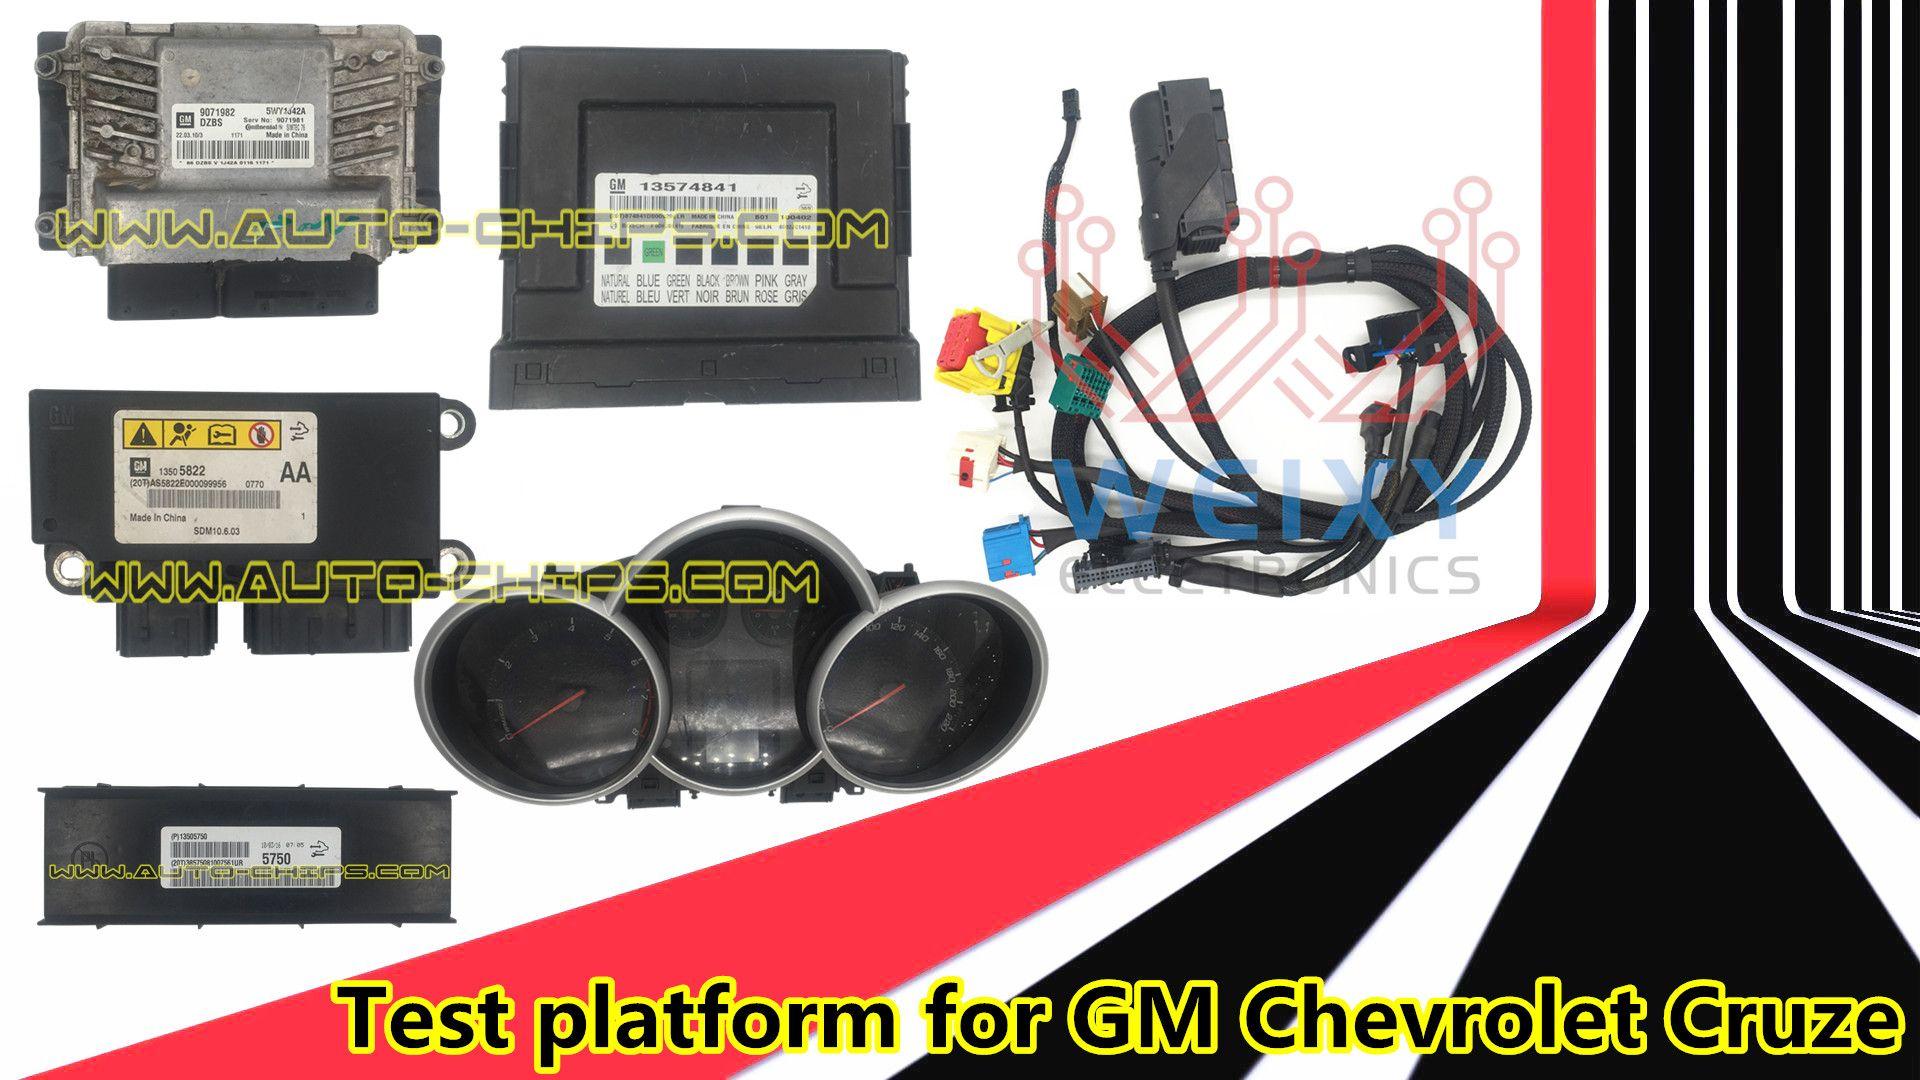 hight resolution of gm chevrolet cruze test platform enable programing keys on the bench restore airbag ecm